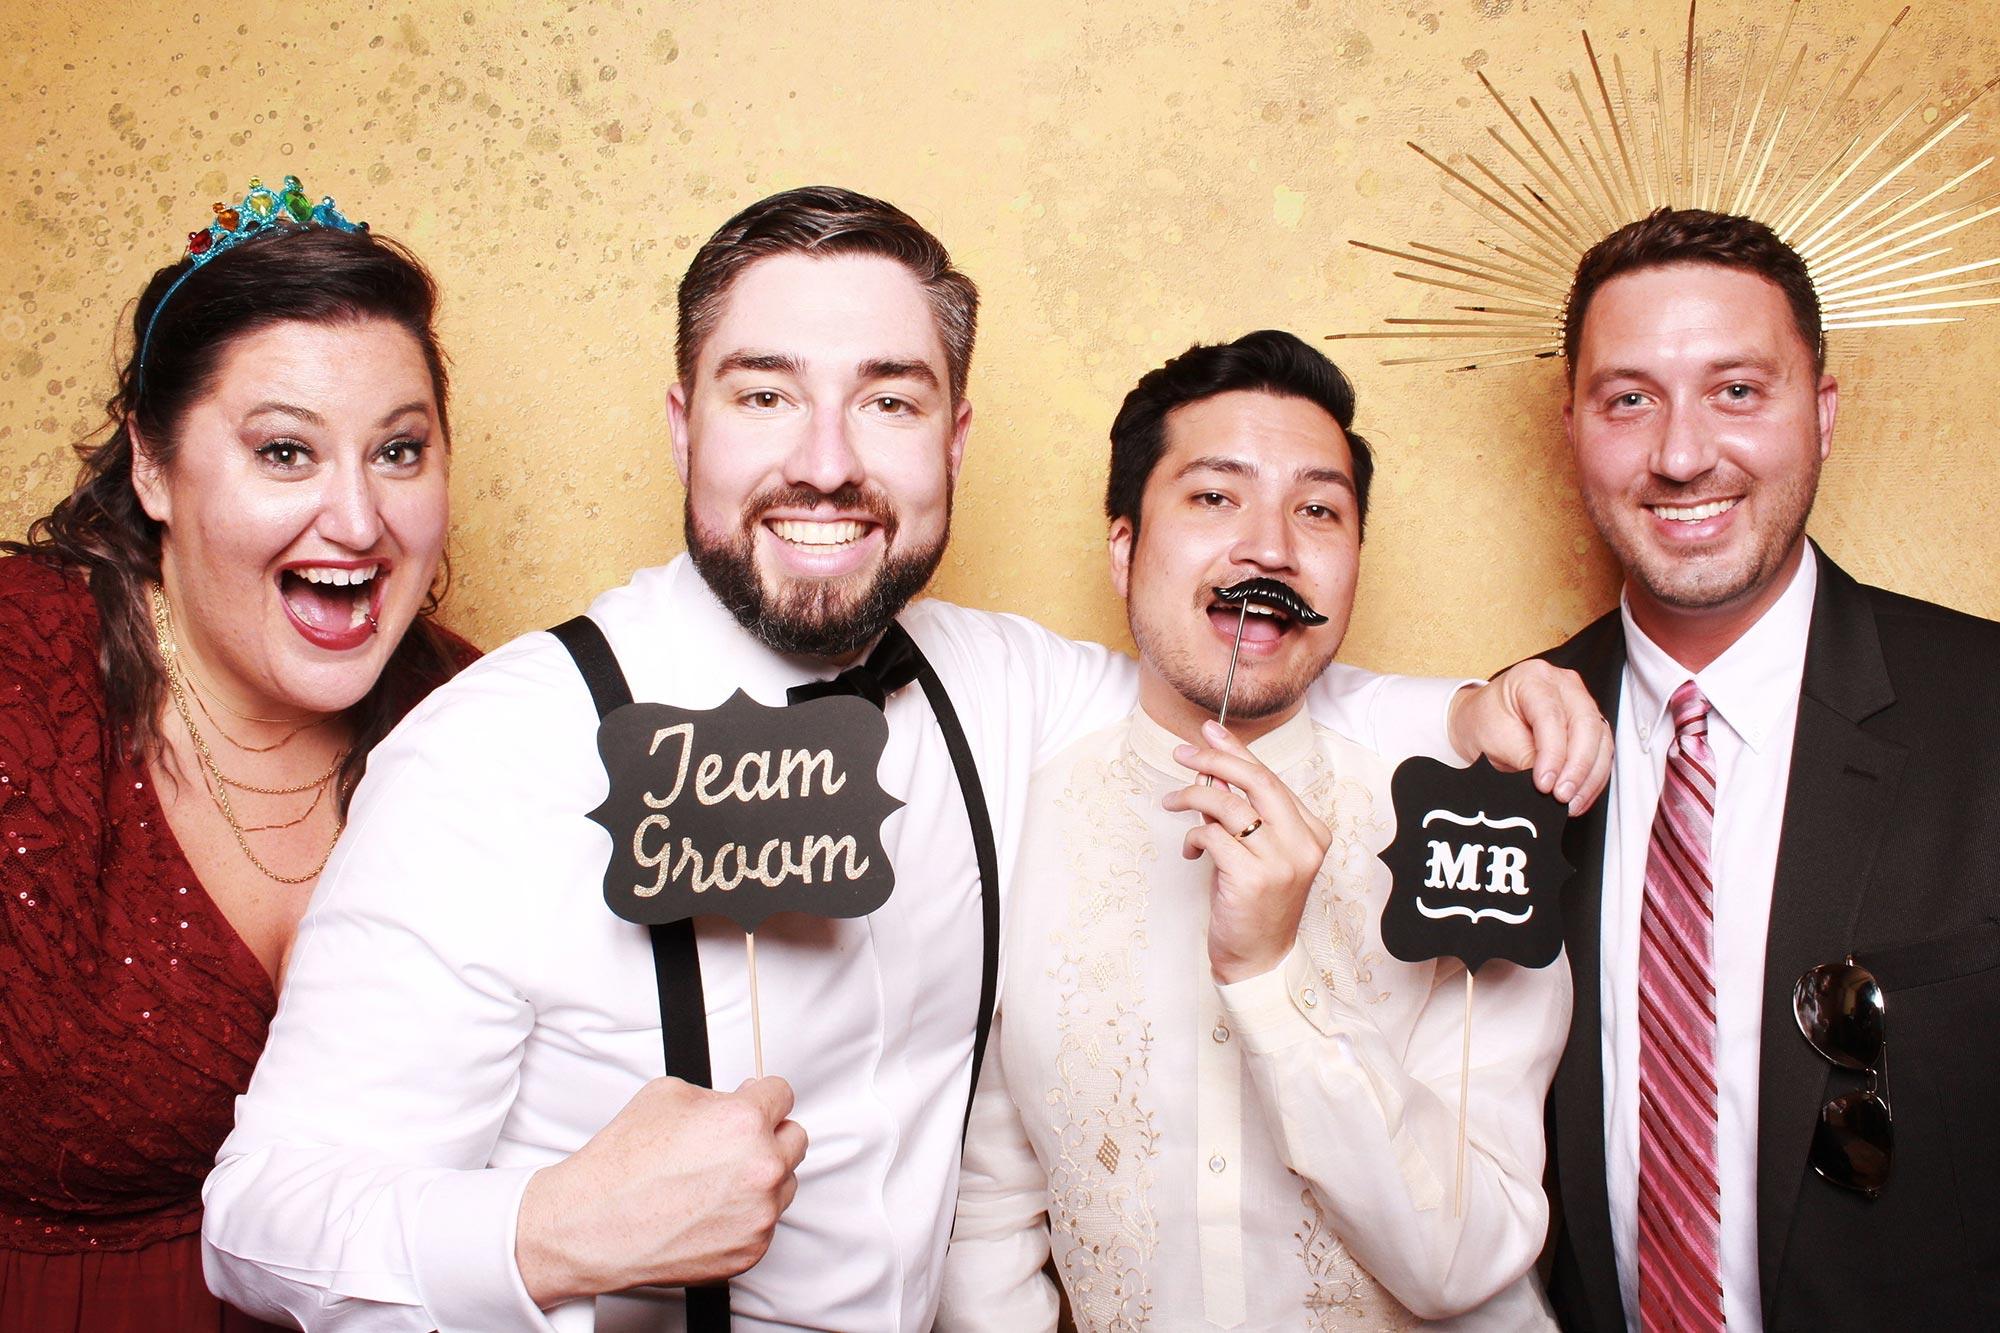 Gay weddings with The SnapBar